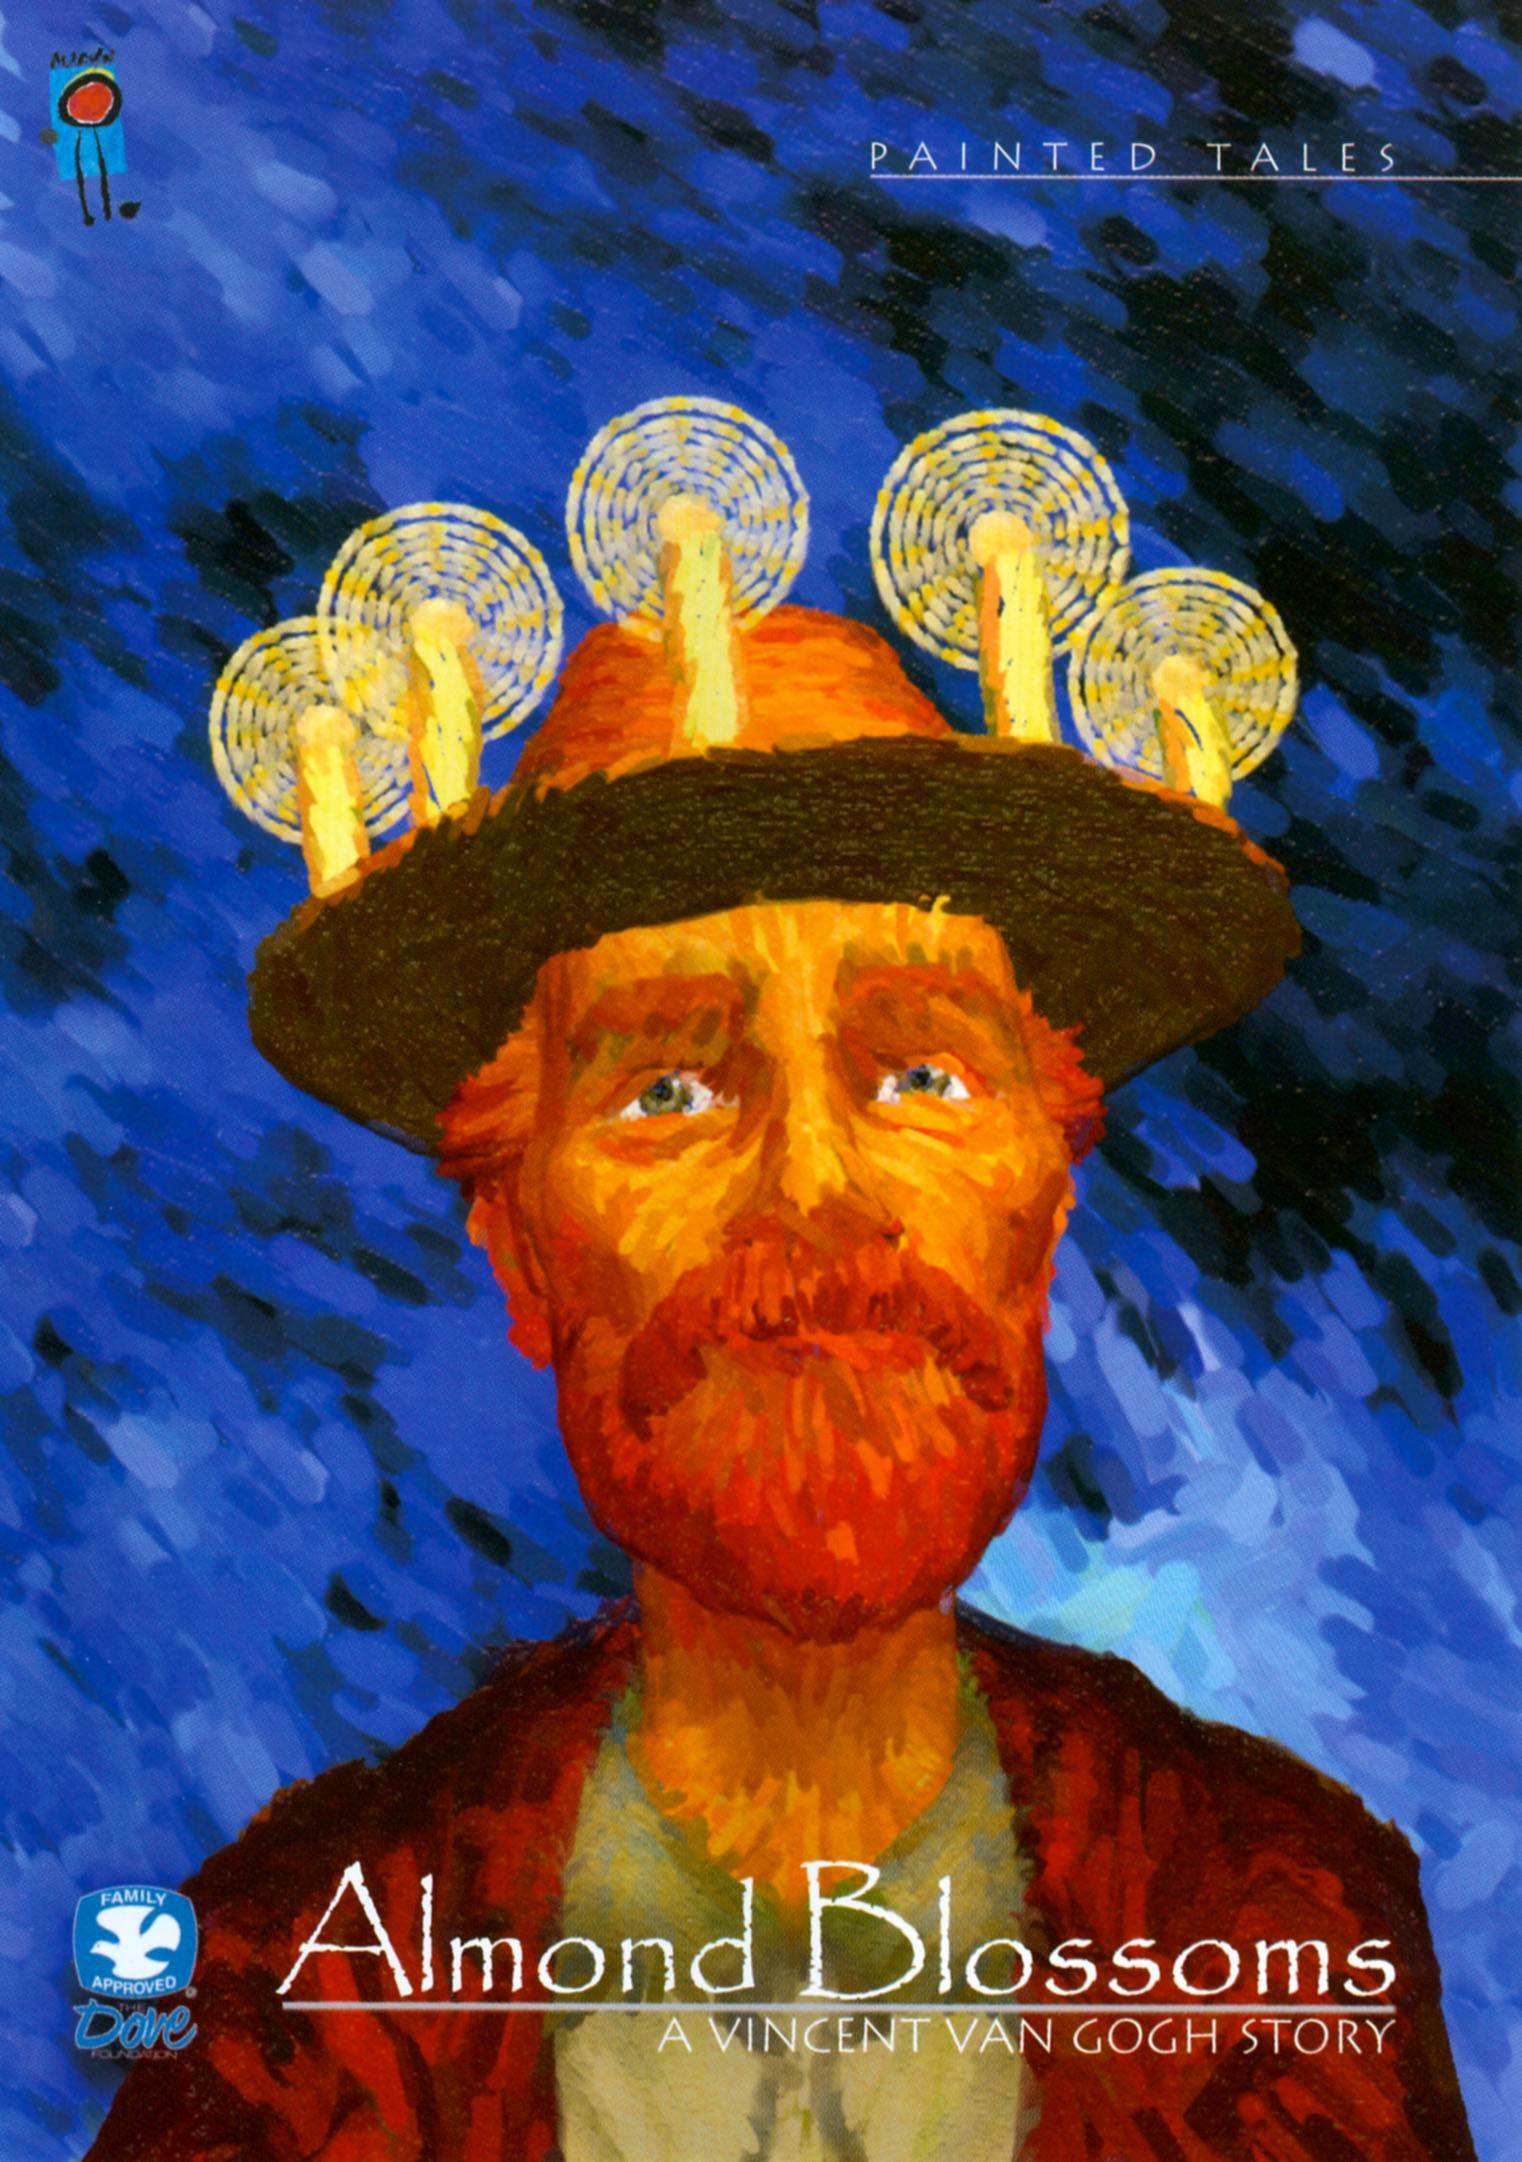 Almond Blossoms: A Vincent Van Gogh Story